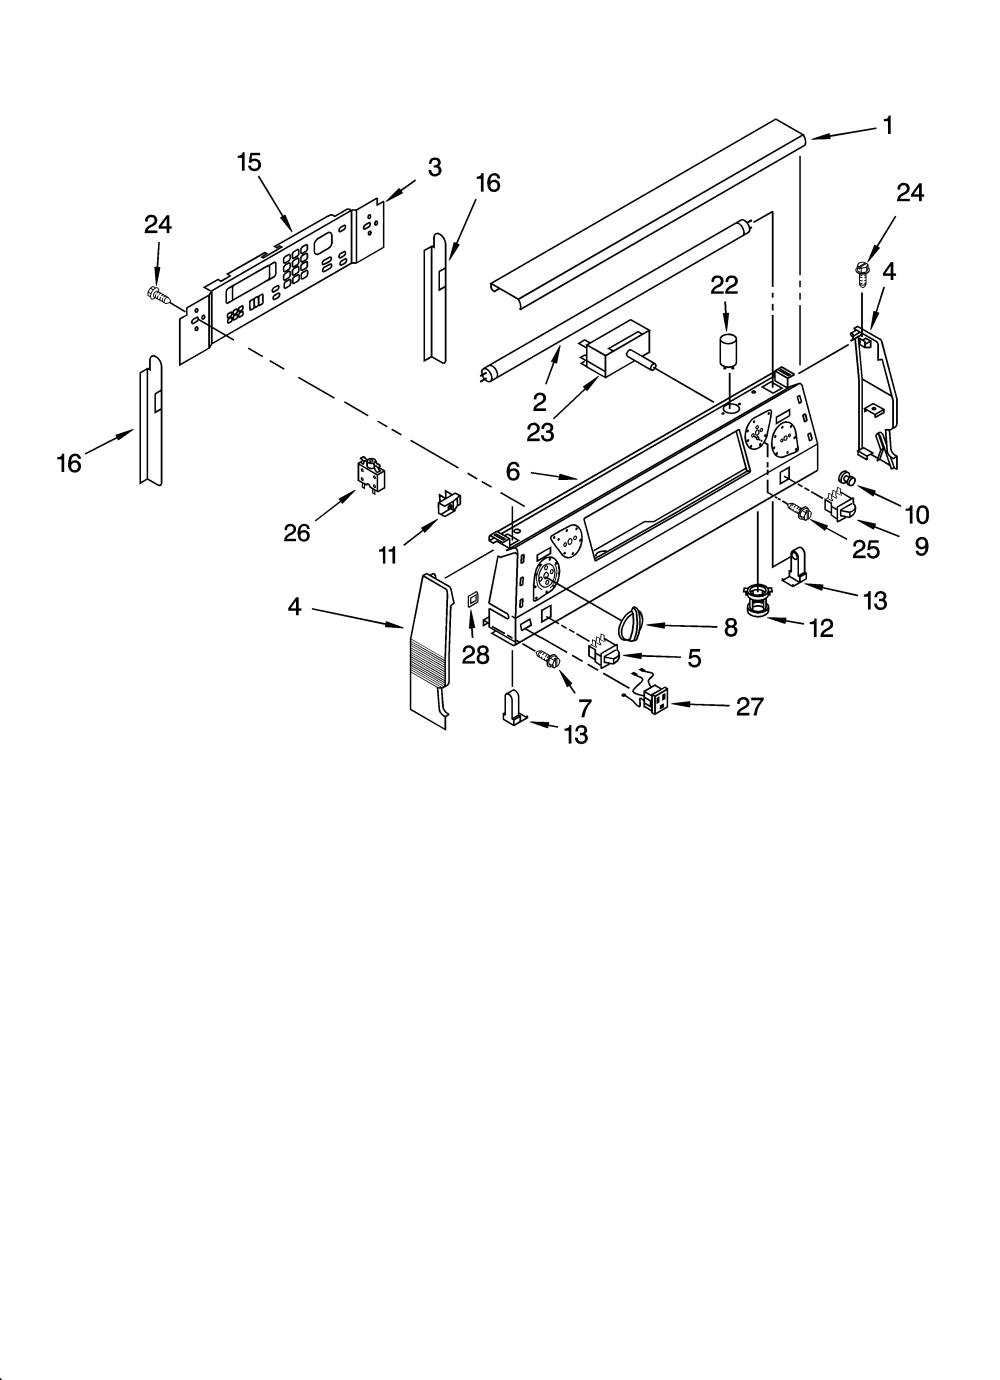 medium resolution of whirlpool ykerc507hw2 free standing electric range timer stove kitchenaid superba oven wiring diagram